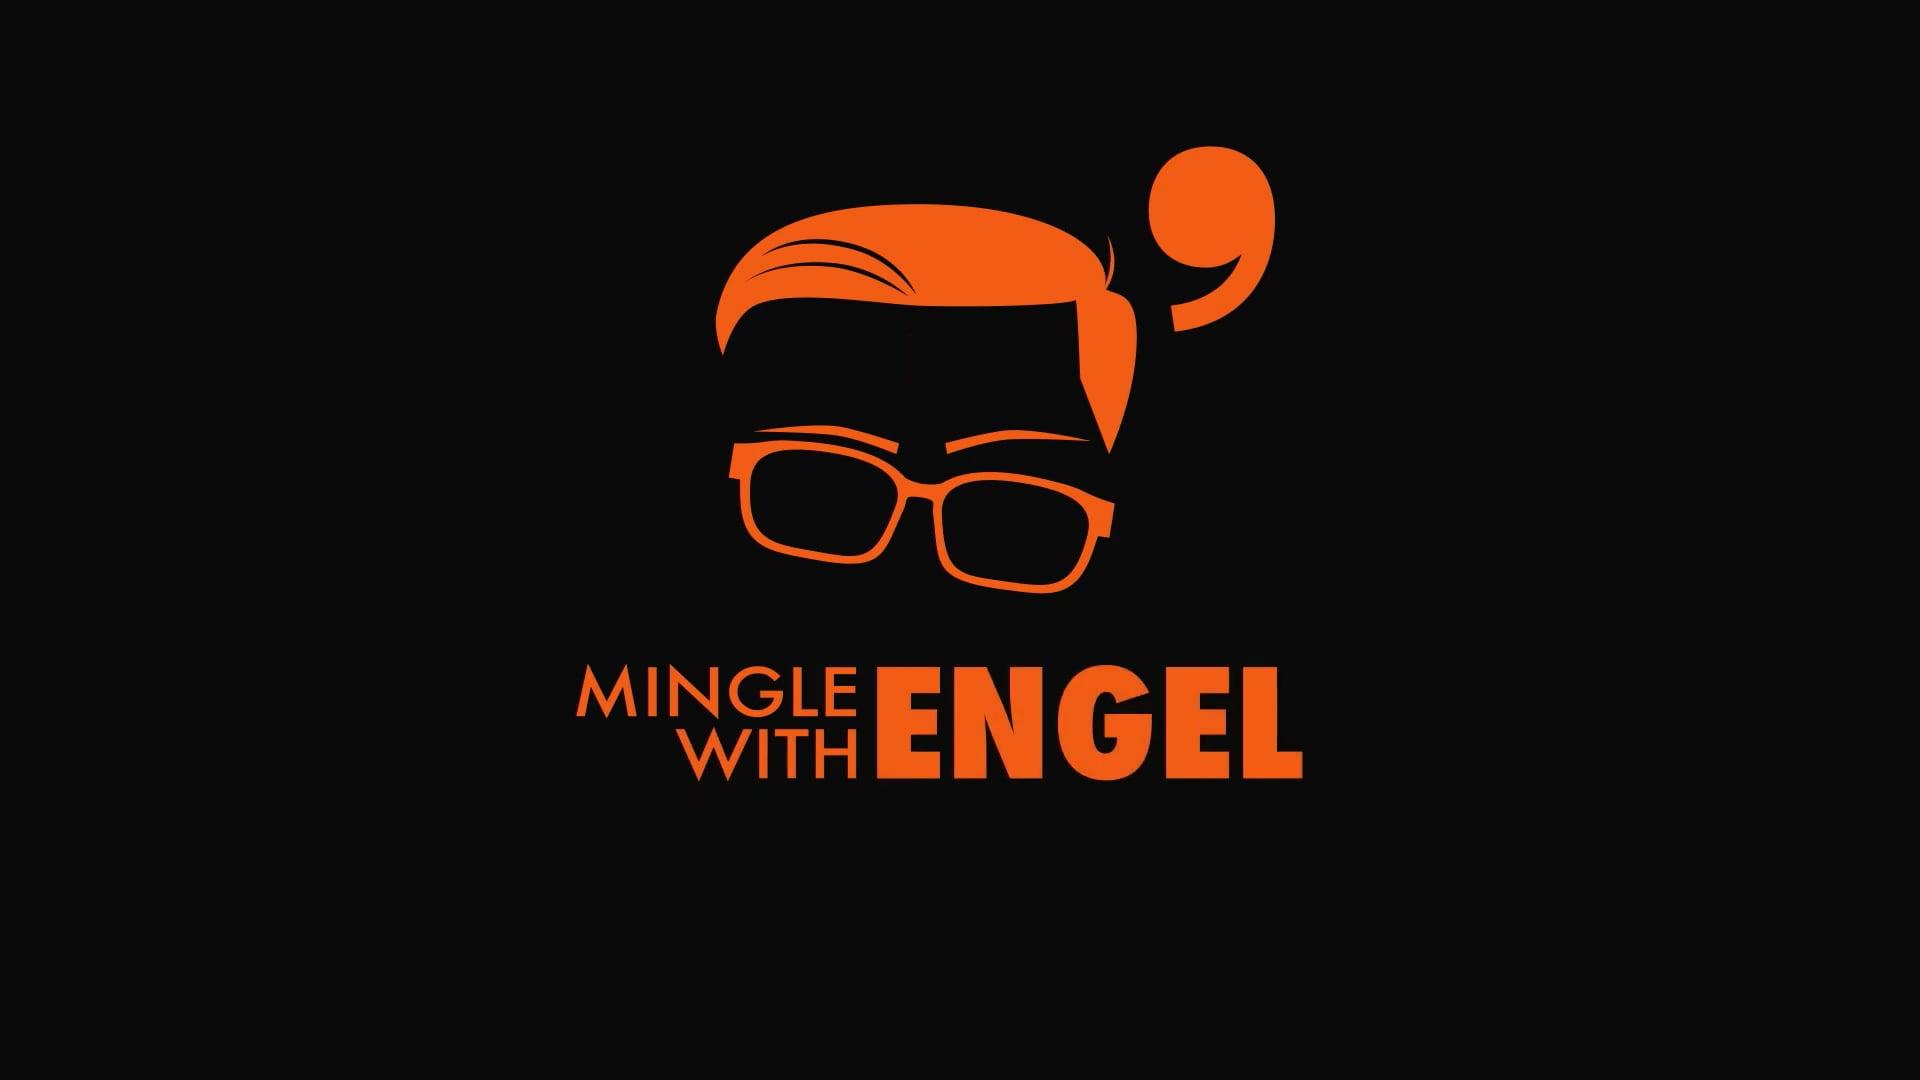 Mingle with Engel - S2 Ep.01